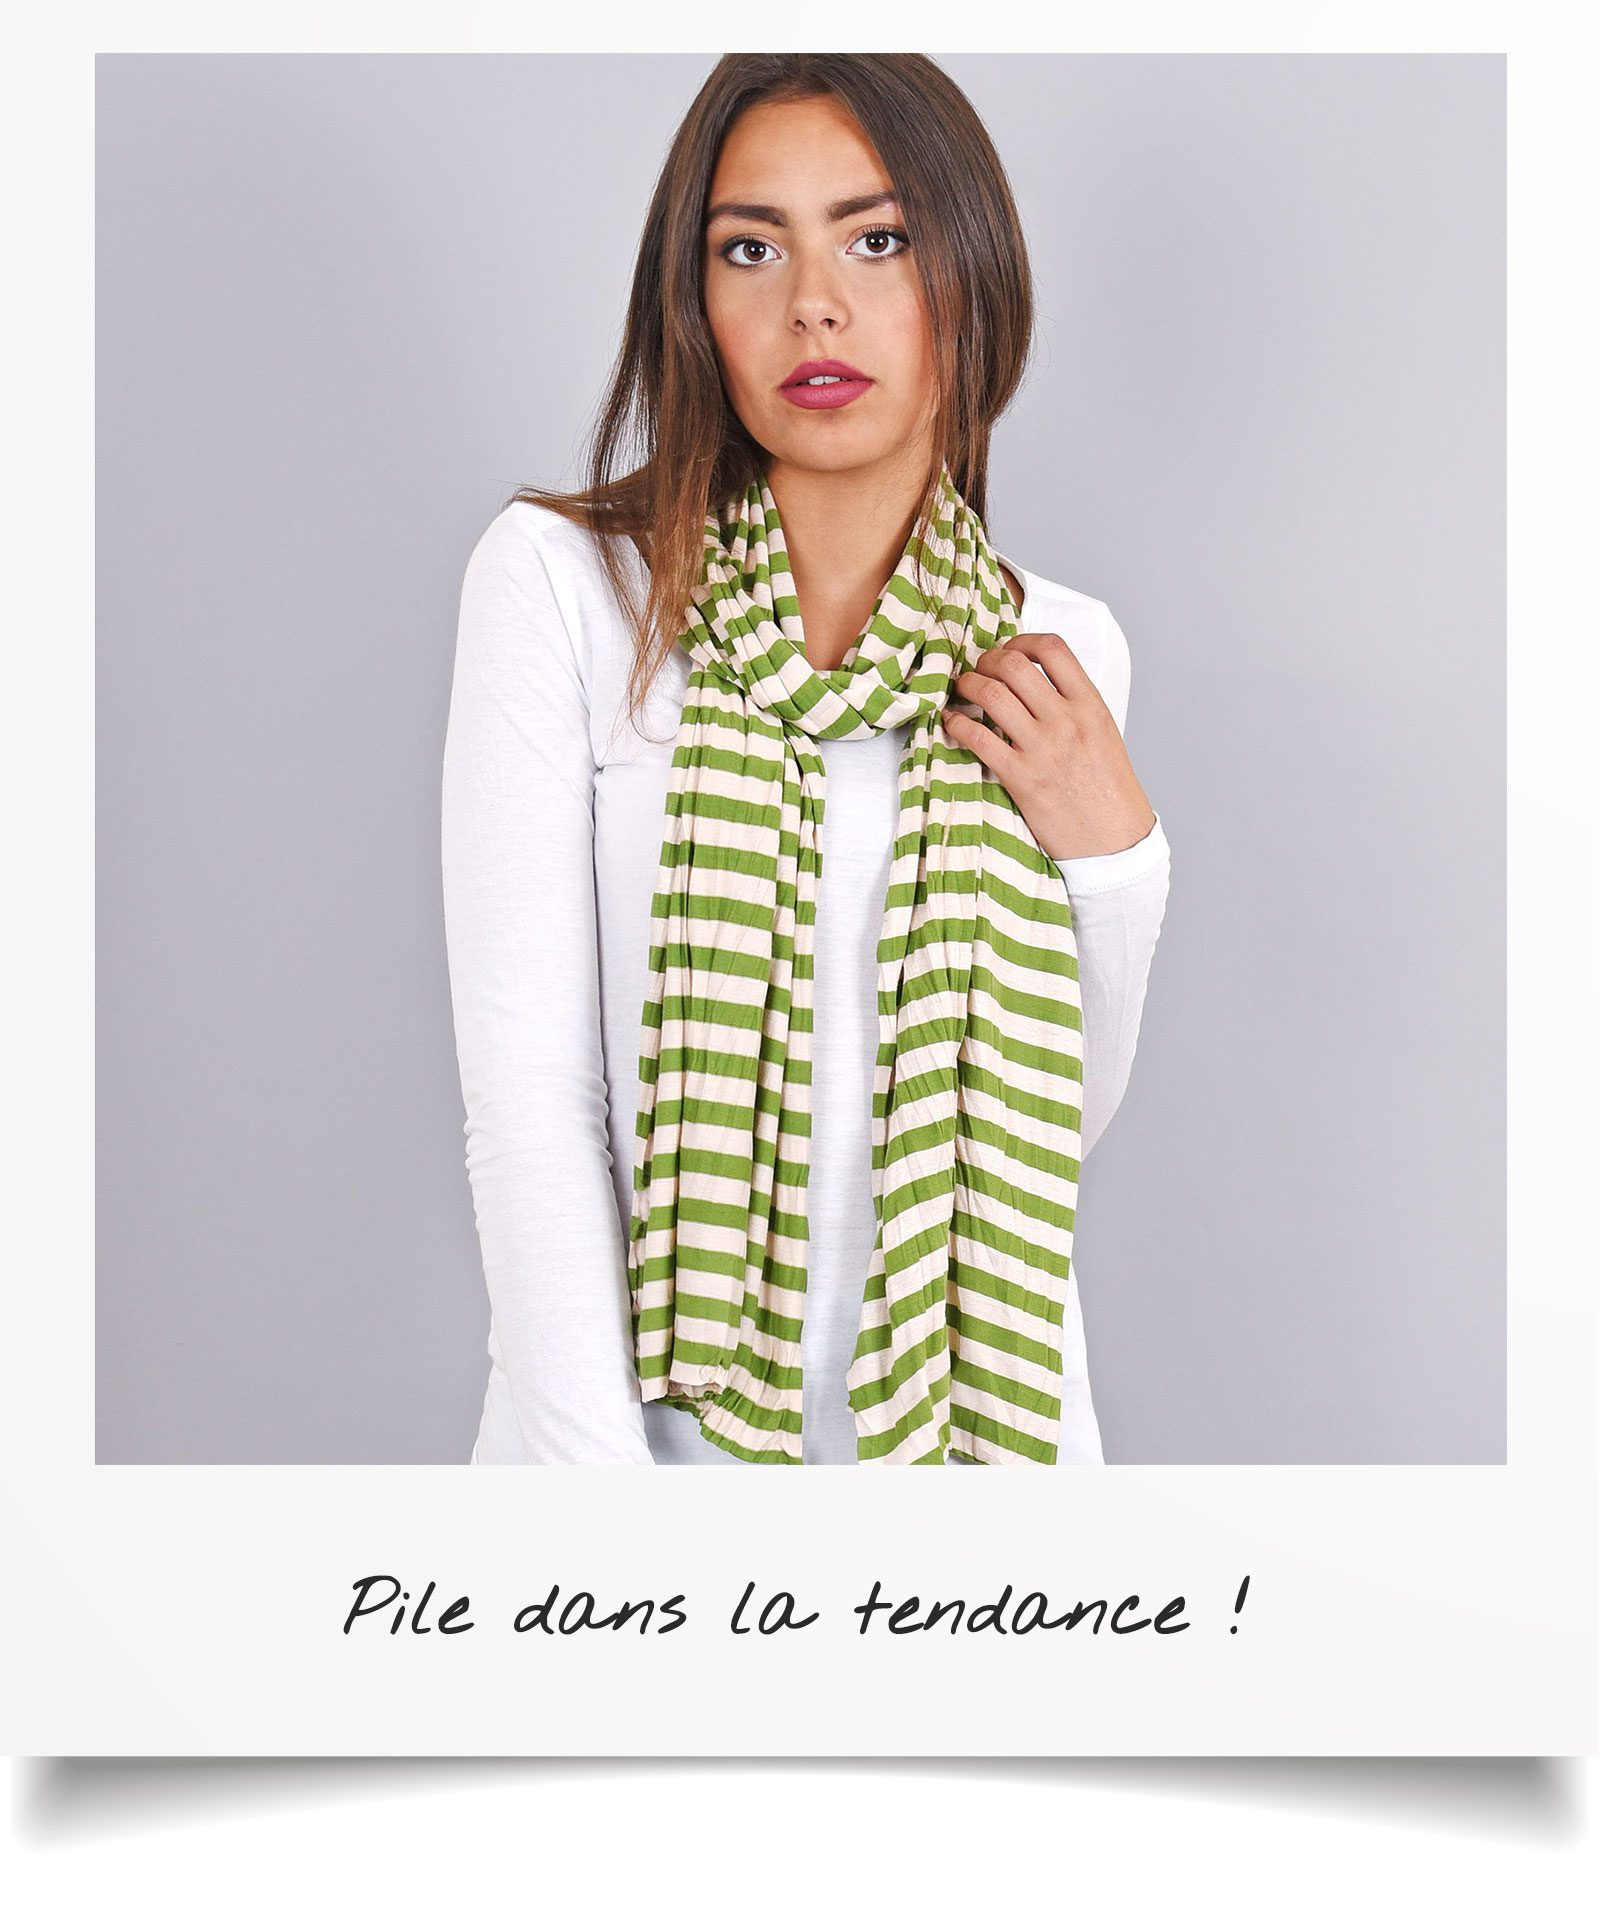 http://lookbook.allee-du-foulard.fr/wp-content/uploads/2018/06/0680-ADF-Accessoires-de-mode-LB-Soldes-Ete-echarpe-rayure-1600x1930.jpg